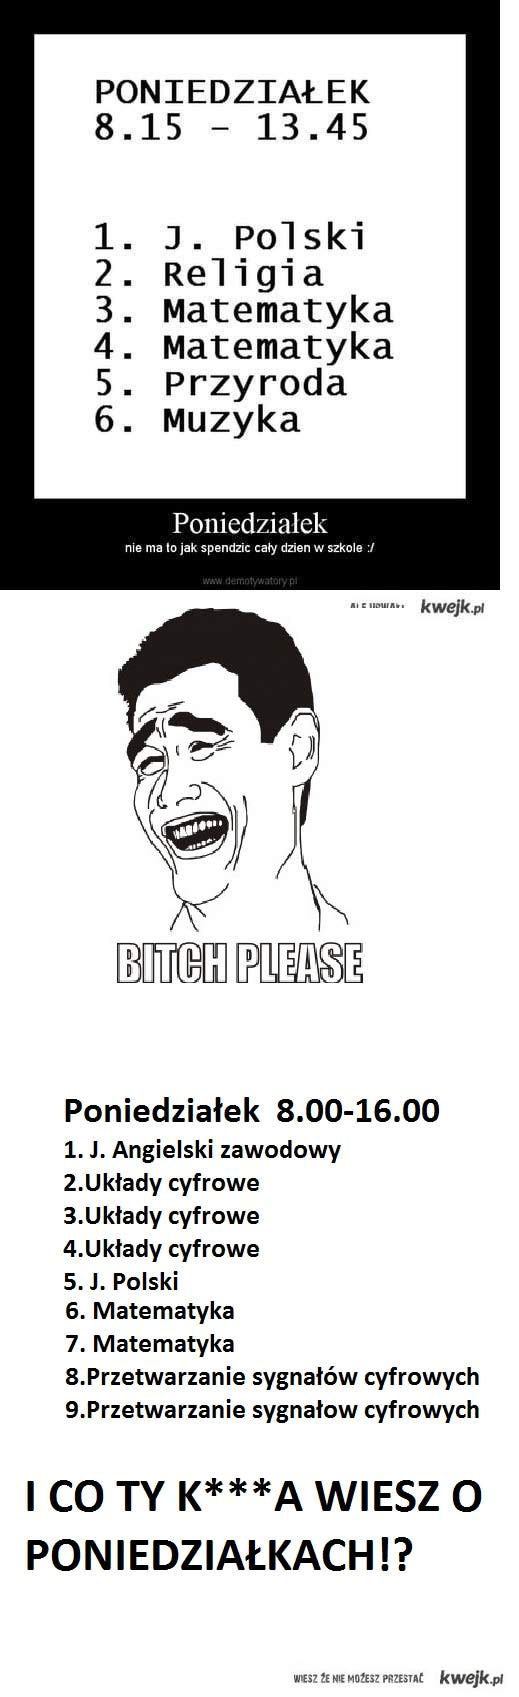 b**ch please...